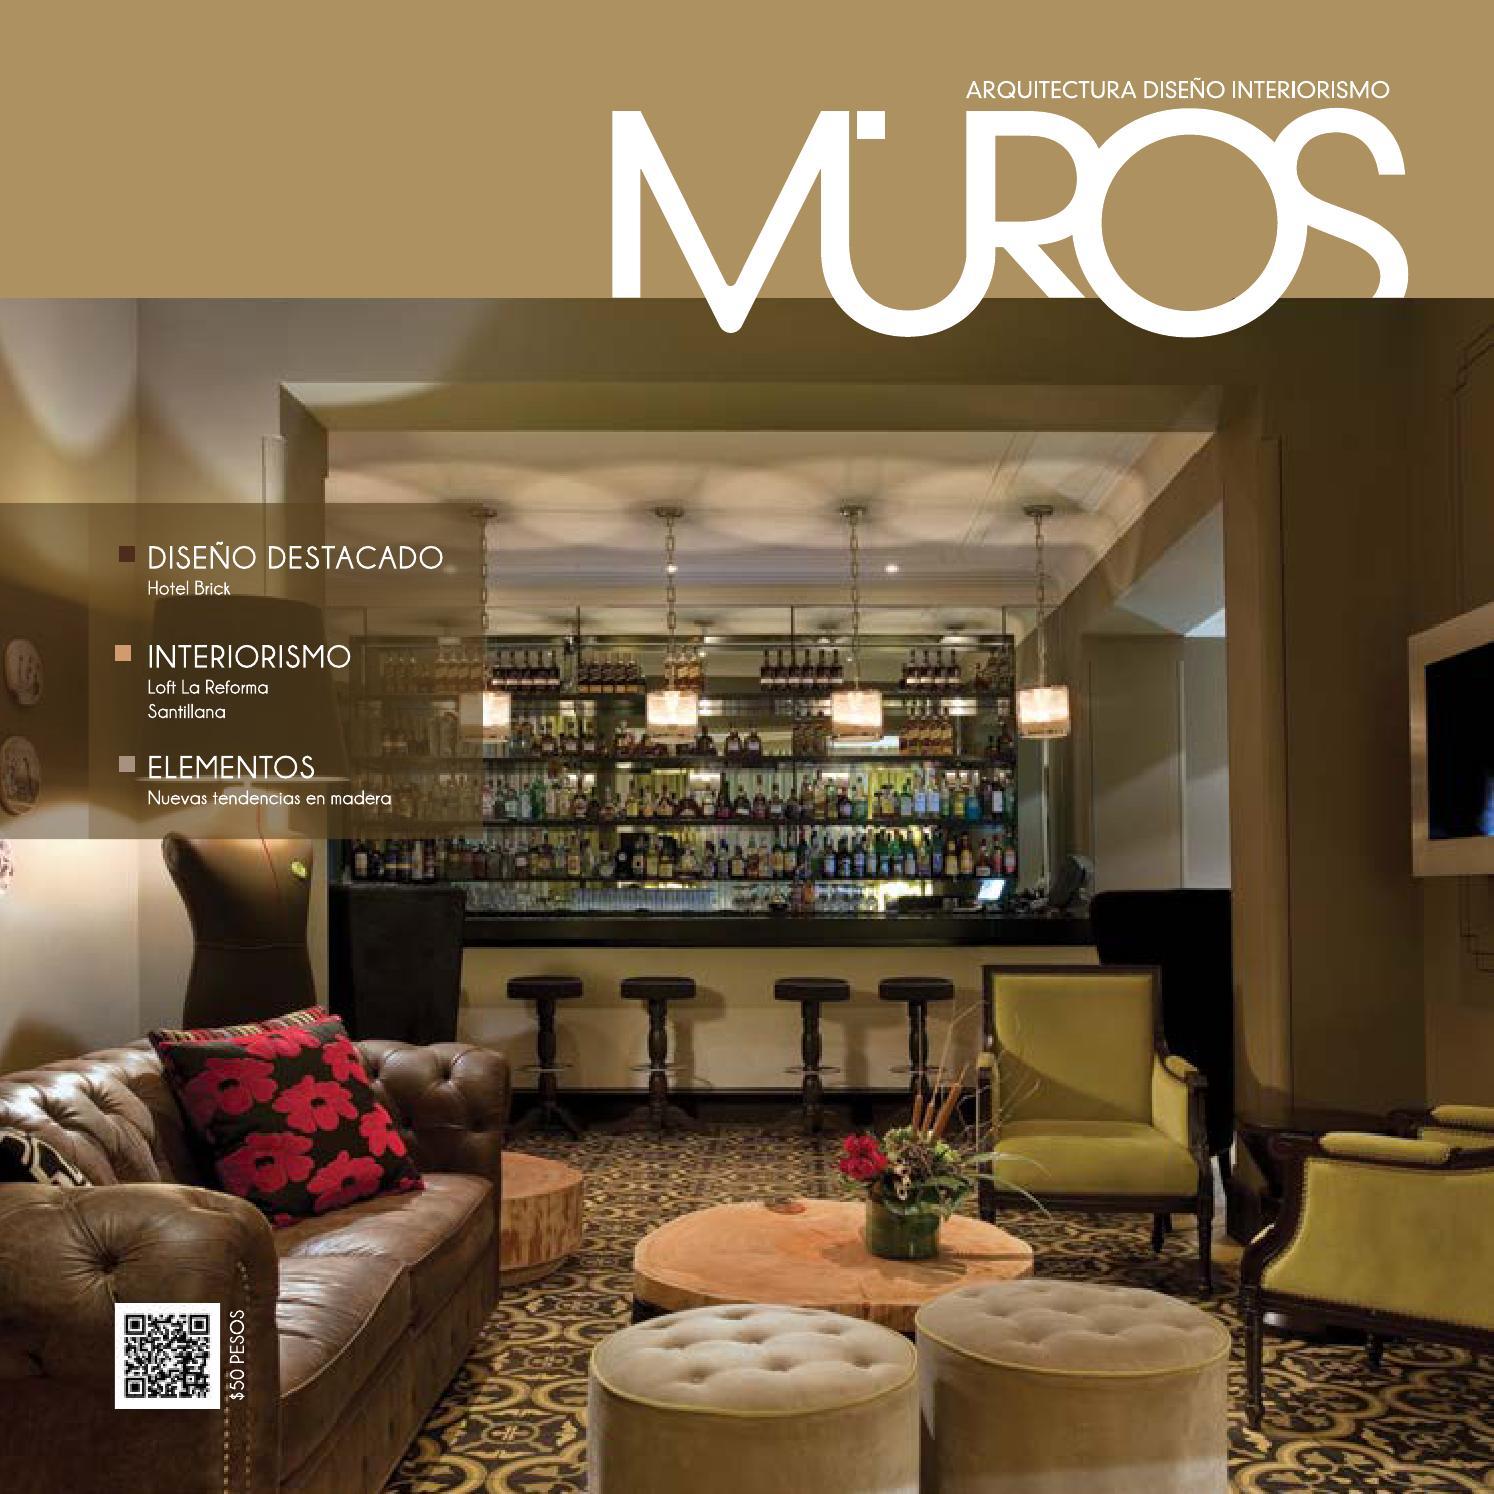 Edici n 1 revista muros arquitectura dise o interiorismo for Revista habitat arquitectura diseno interiorismo